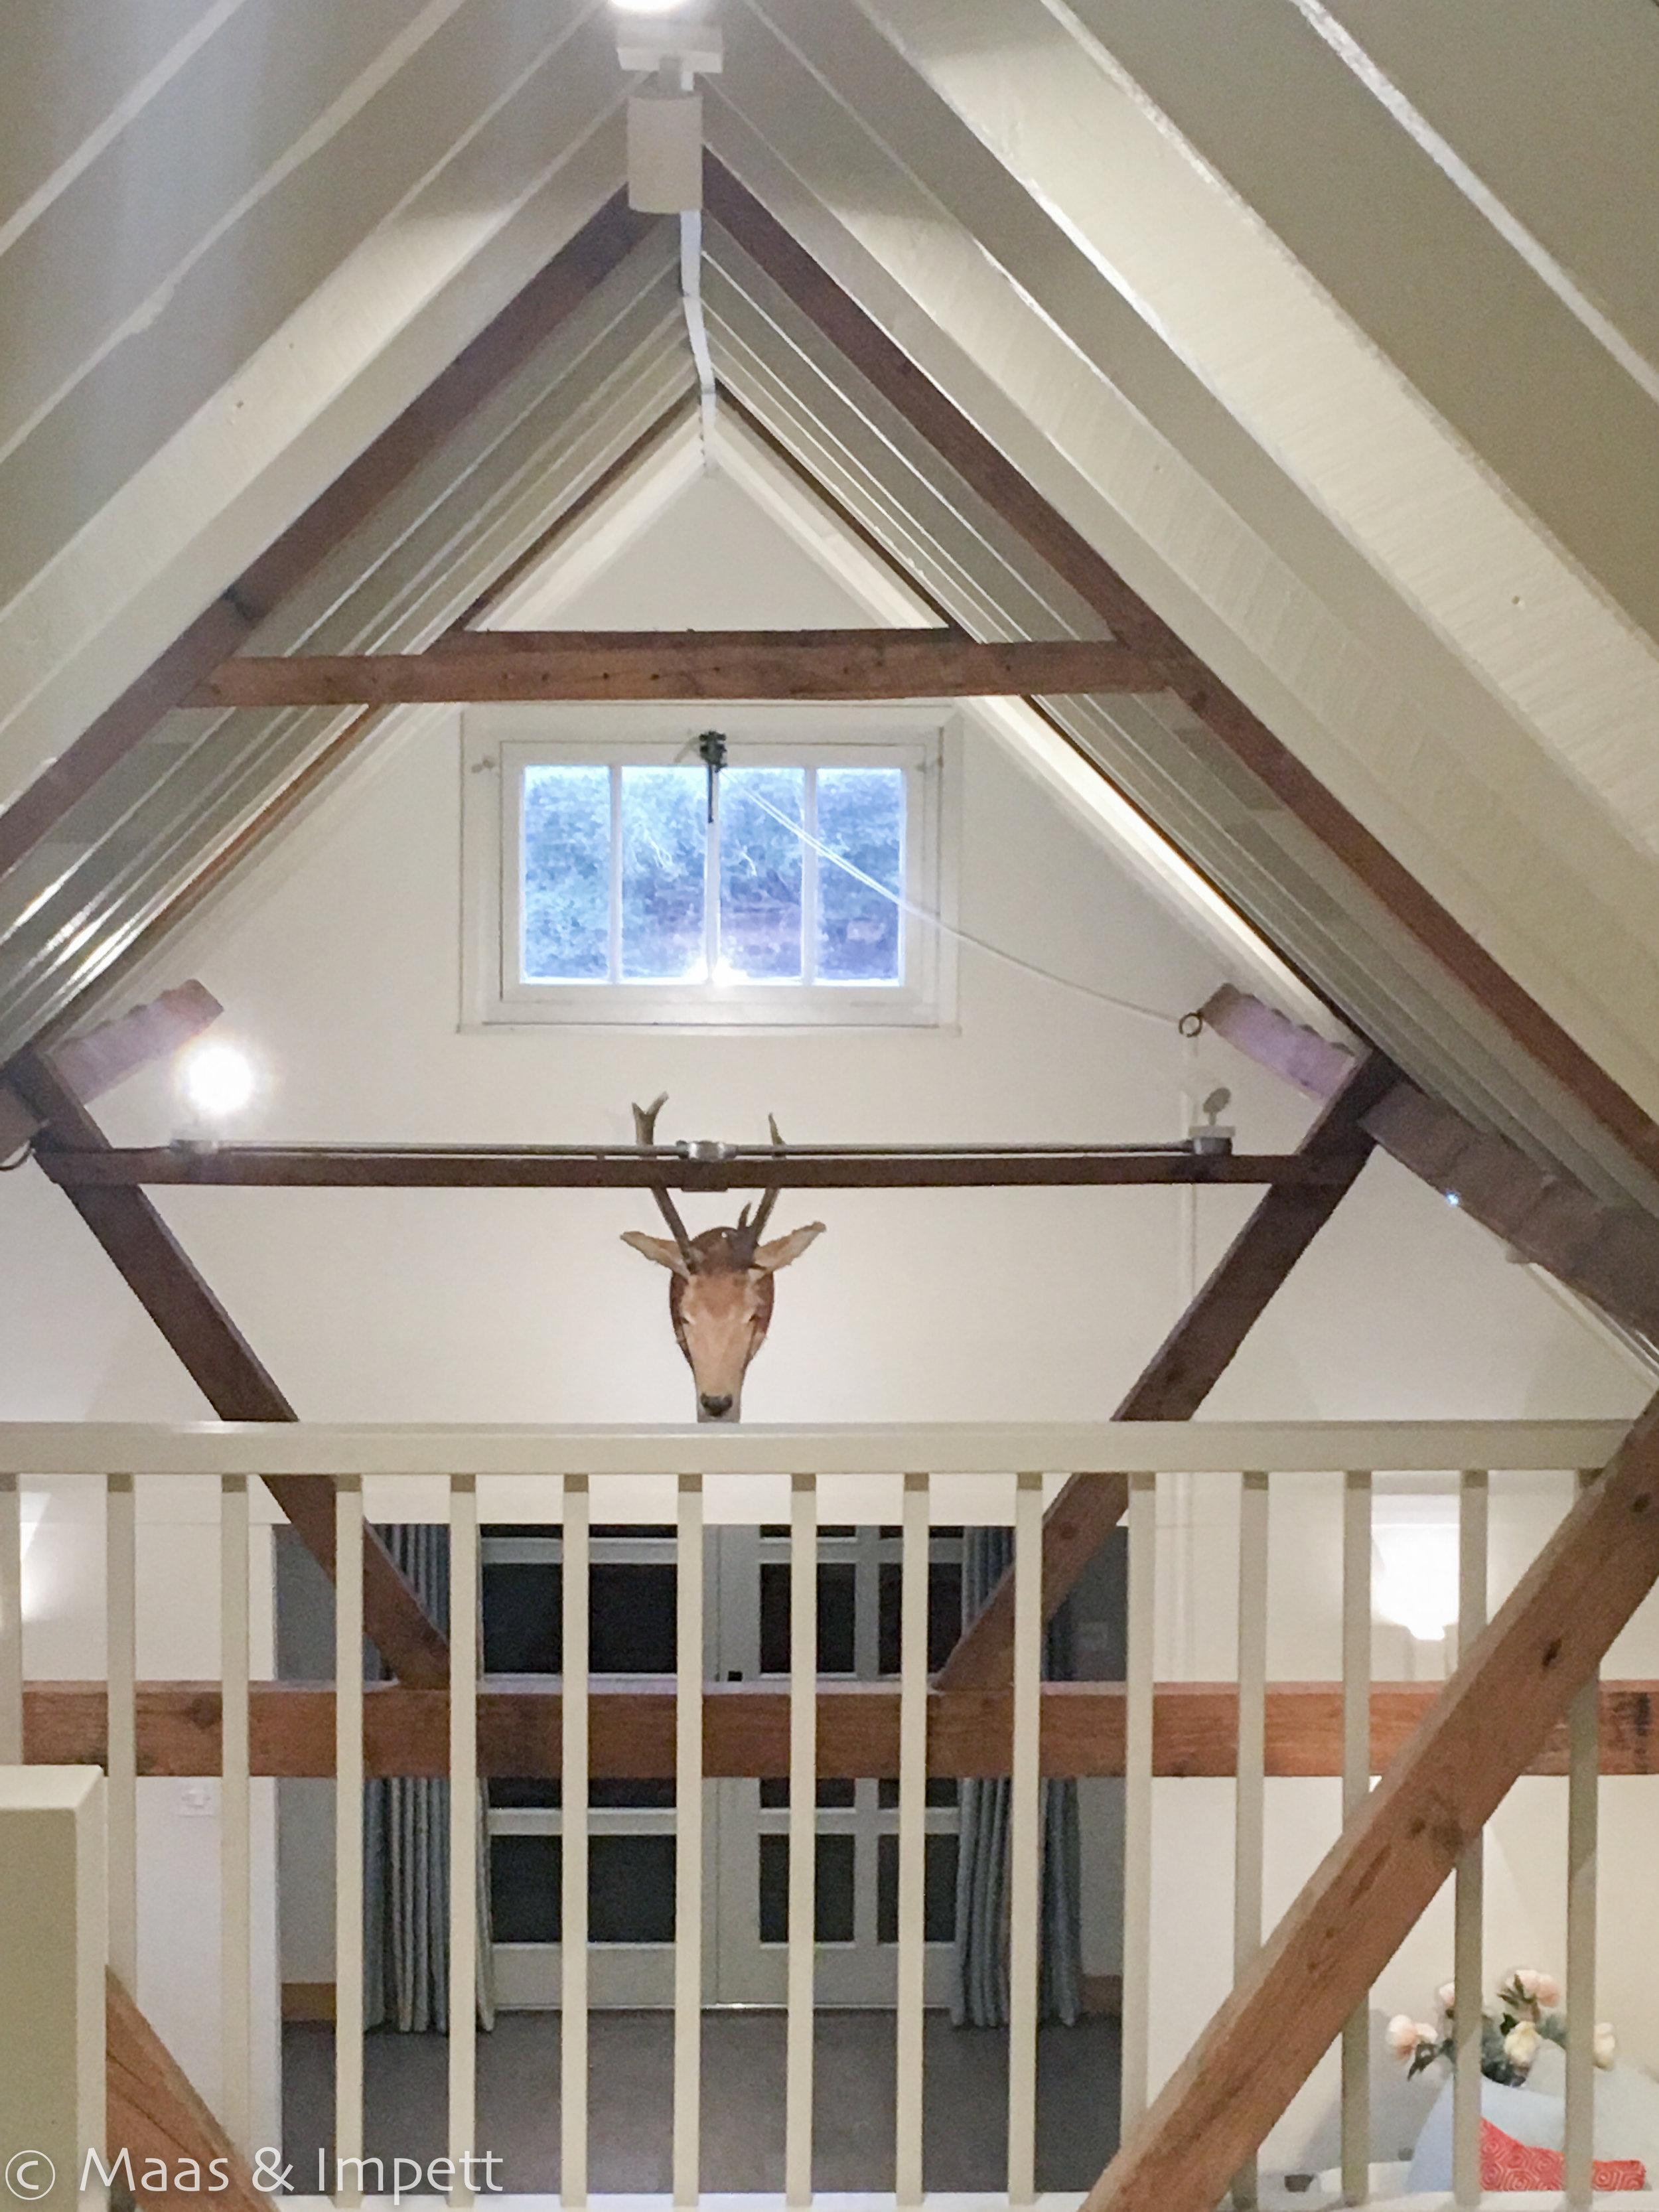 Period conversion with contemporary interior